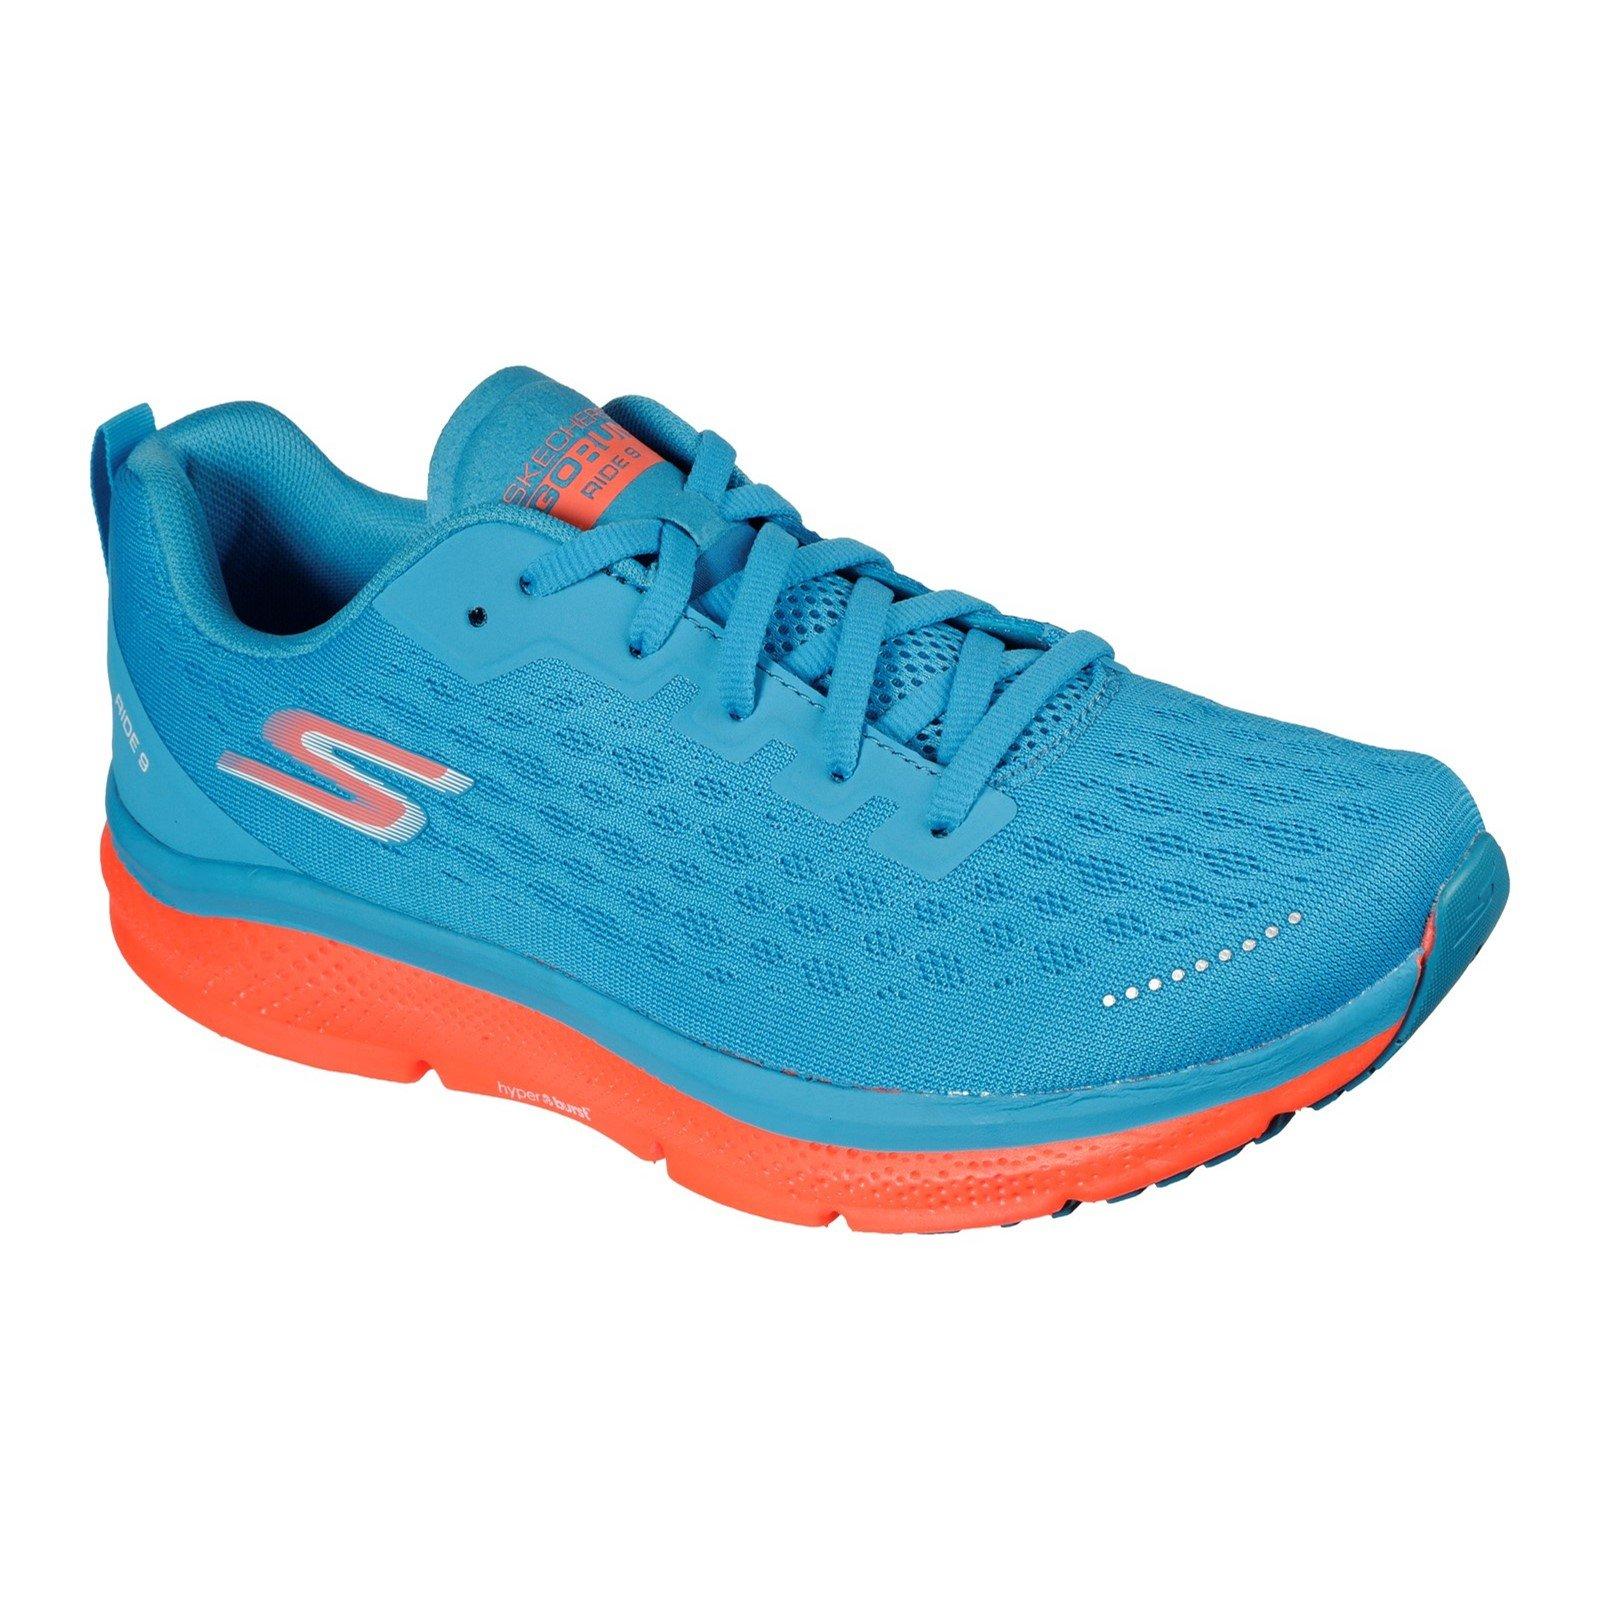 Skechers Men's Go Run Ride 9 Trainer Various Colours 32701 - Blue/Coral 10